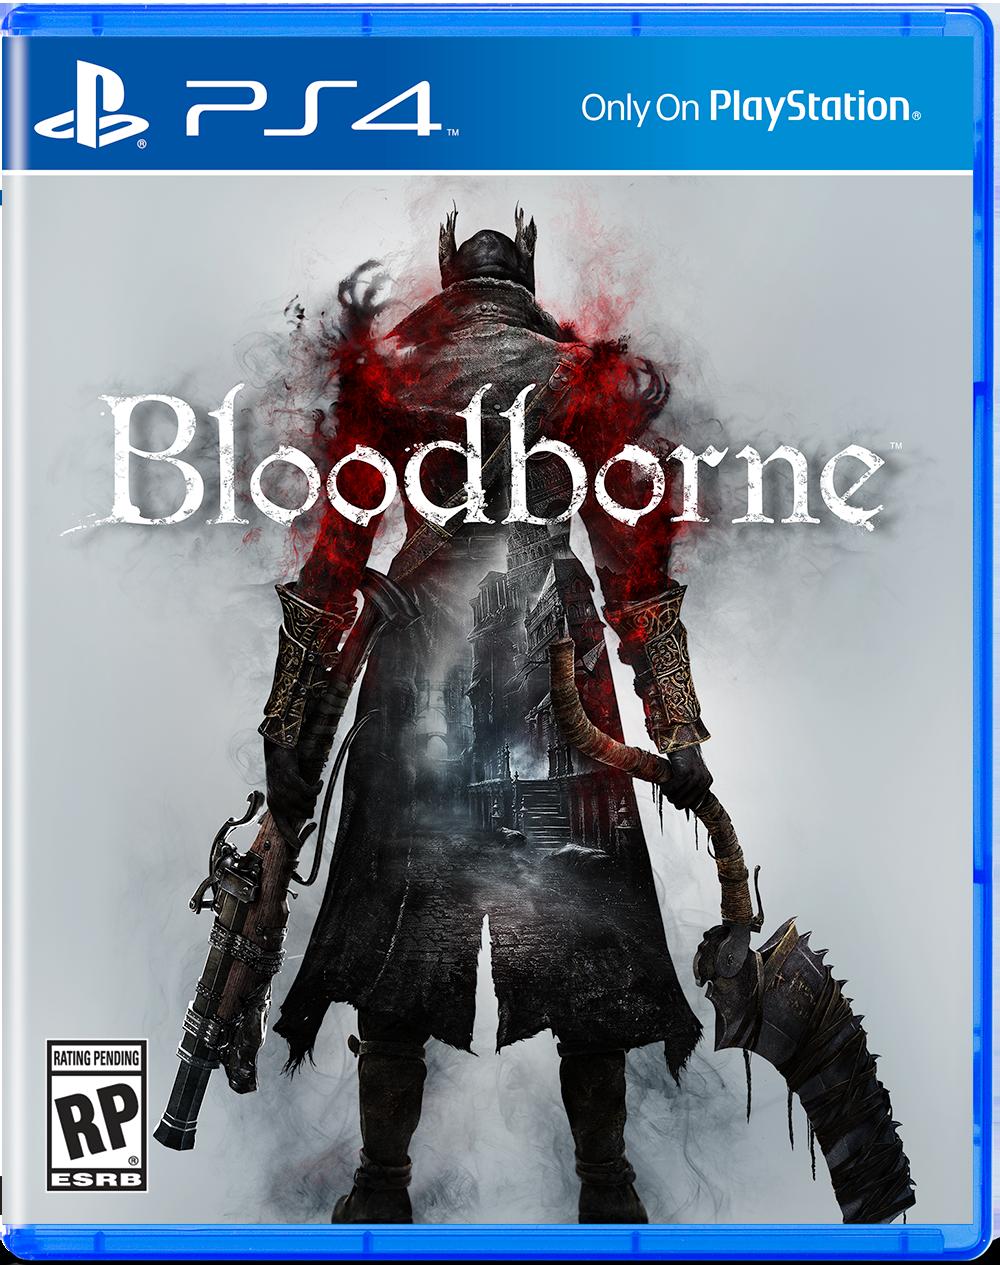 bloodborne-copertina-ps4